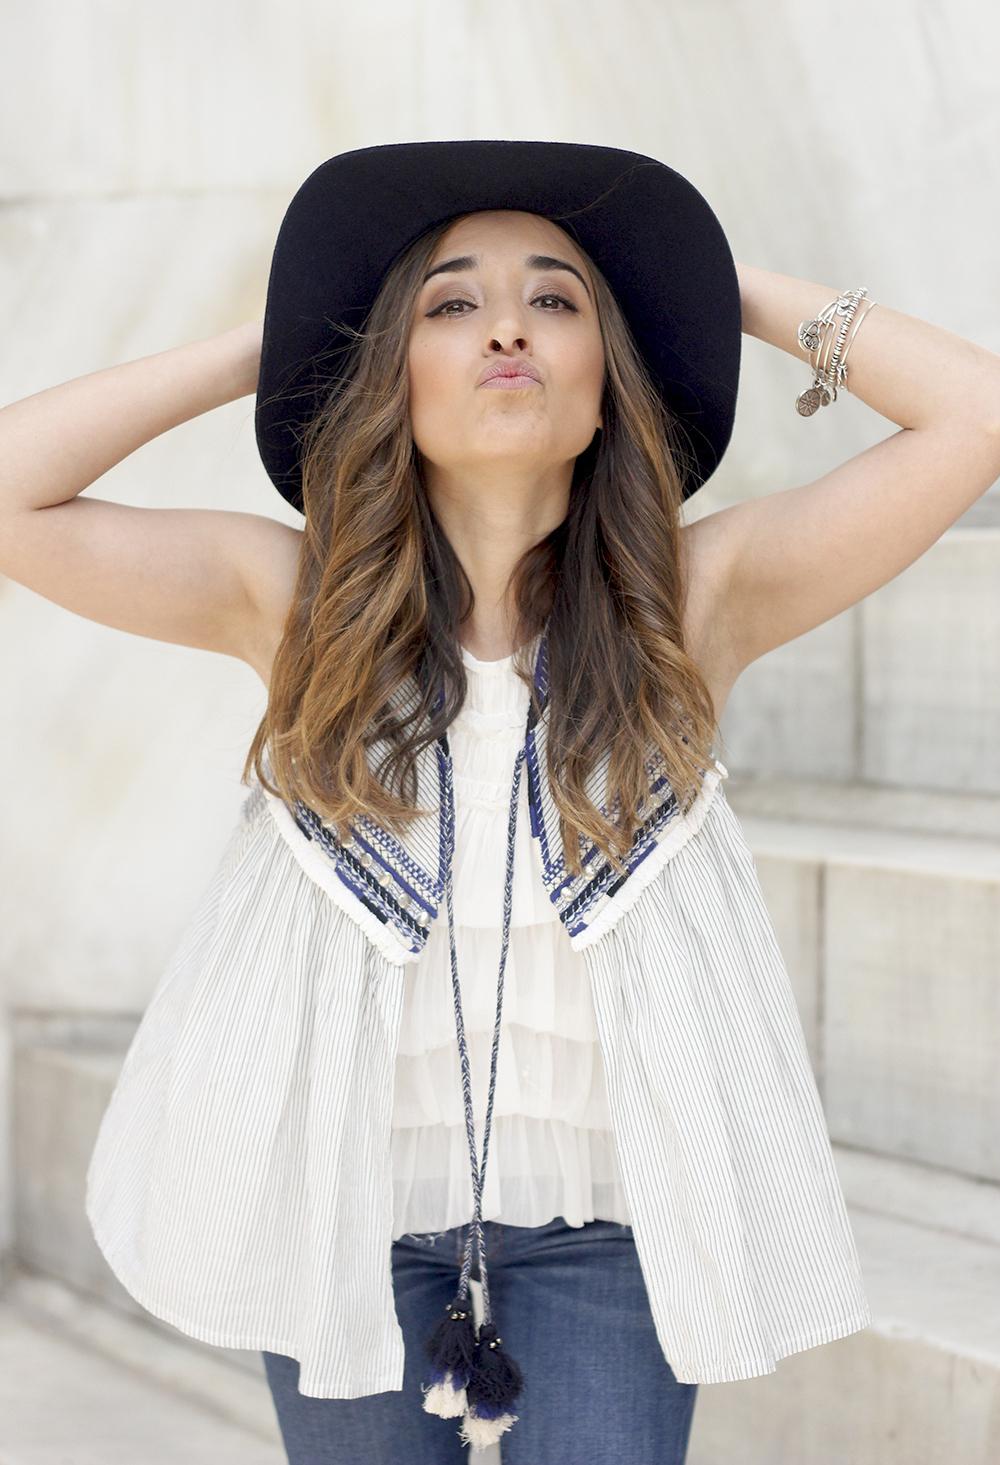 boho vest jeans heels blue hat alex and ani bohemian outfit25